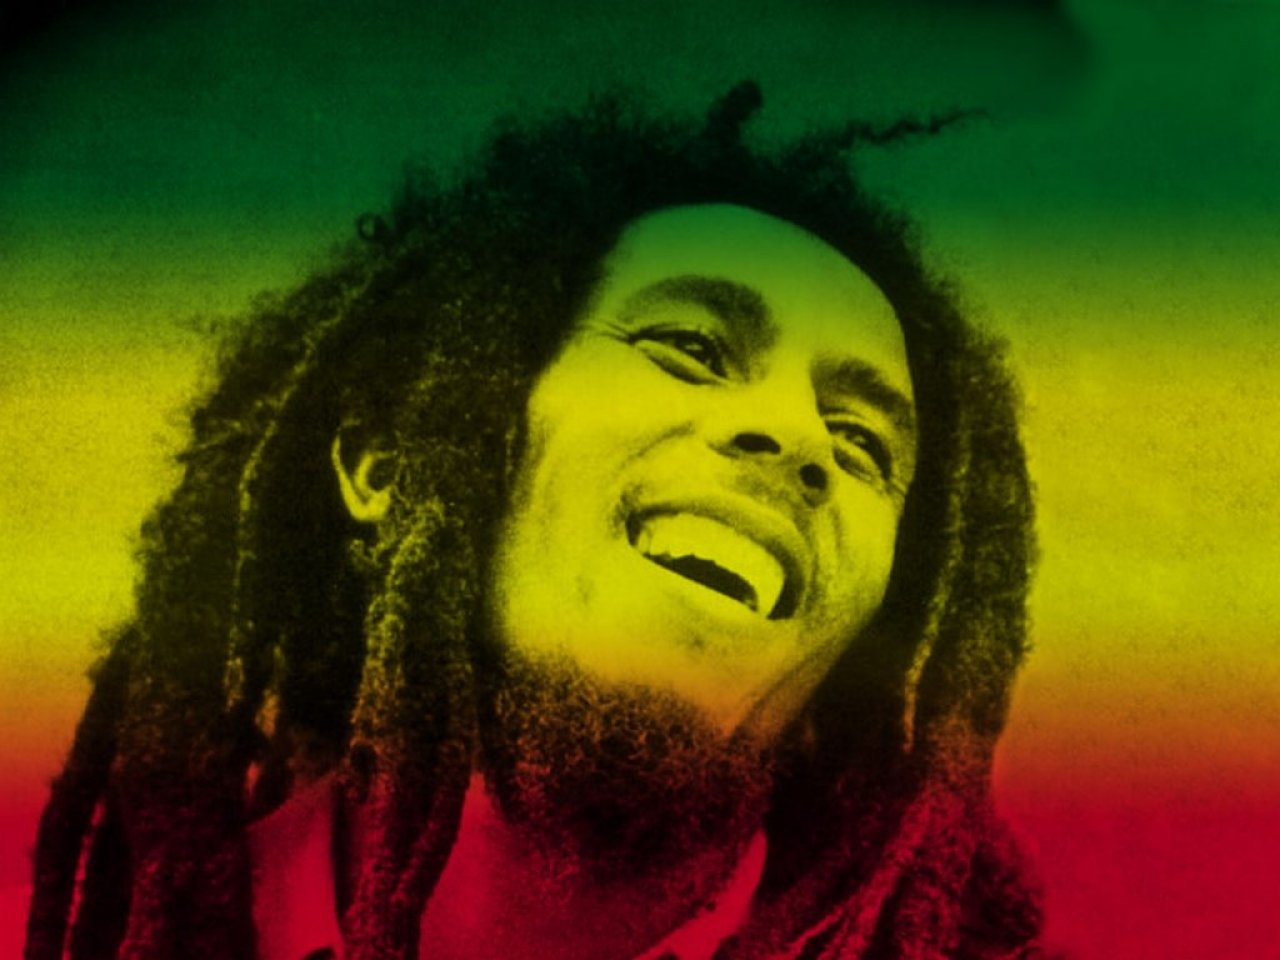 http://2.bp.blogspot.com/_Oojzj9N2ELY/TG537M45w_I/AAAAAAAAABk/a2LD00NVGTA/s1600/306472Bob_Marley_wallpaper_picture_image_free_music_Reggae_desktop_wallpaper_1280.jpg